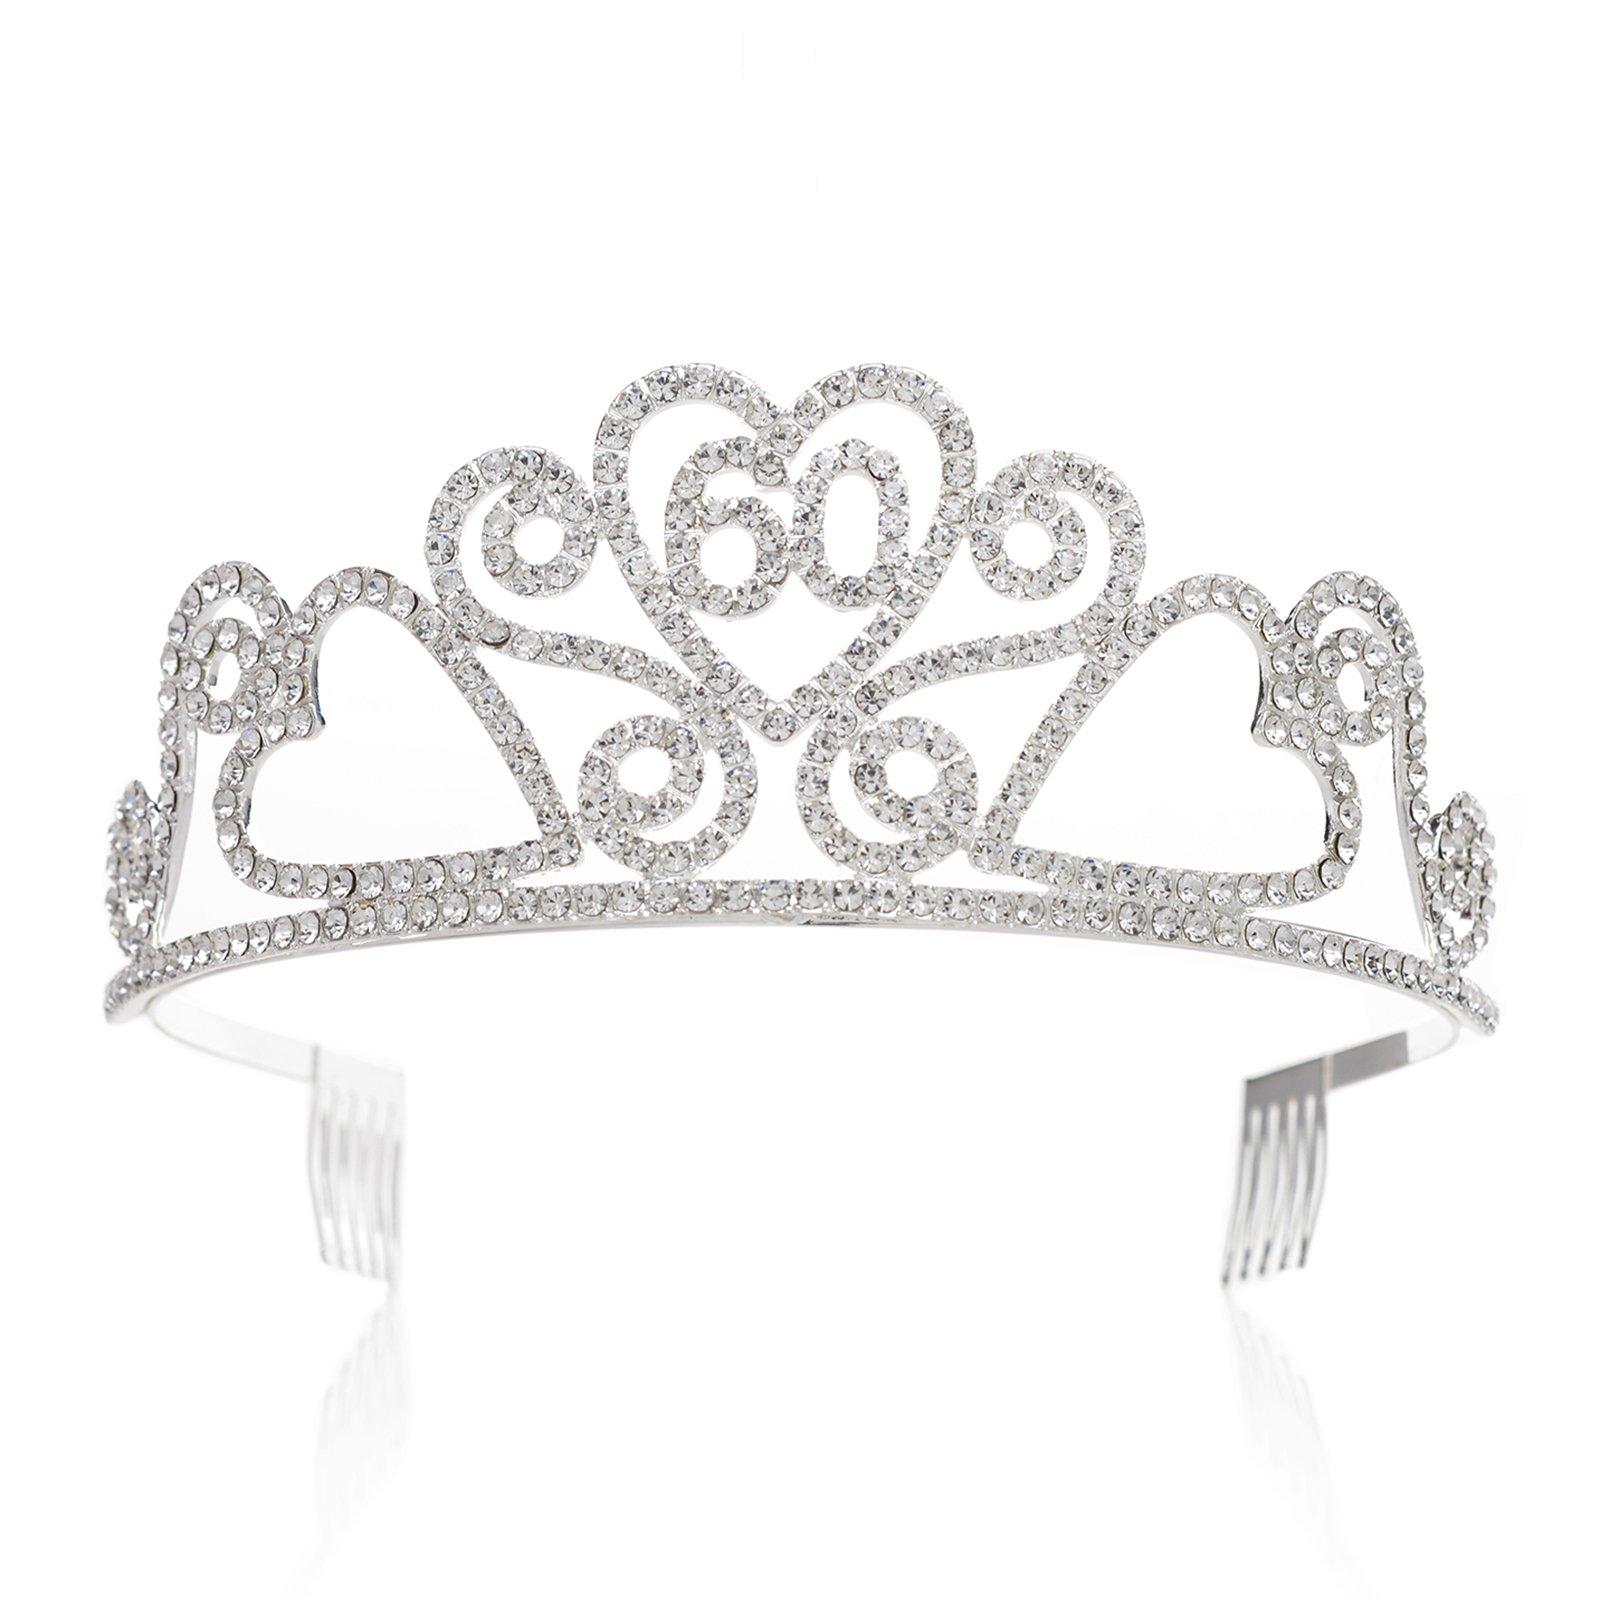 SWEETV Rhinestone Tiara Birthday Crown Princess Party Hat Hair Accessories 15/16/18/21/30/40/50/60/70th Birthday Gift, 60th